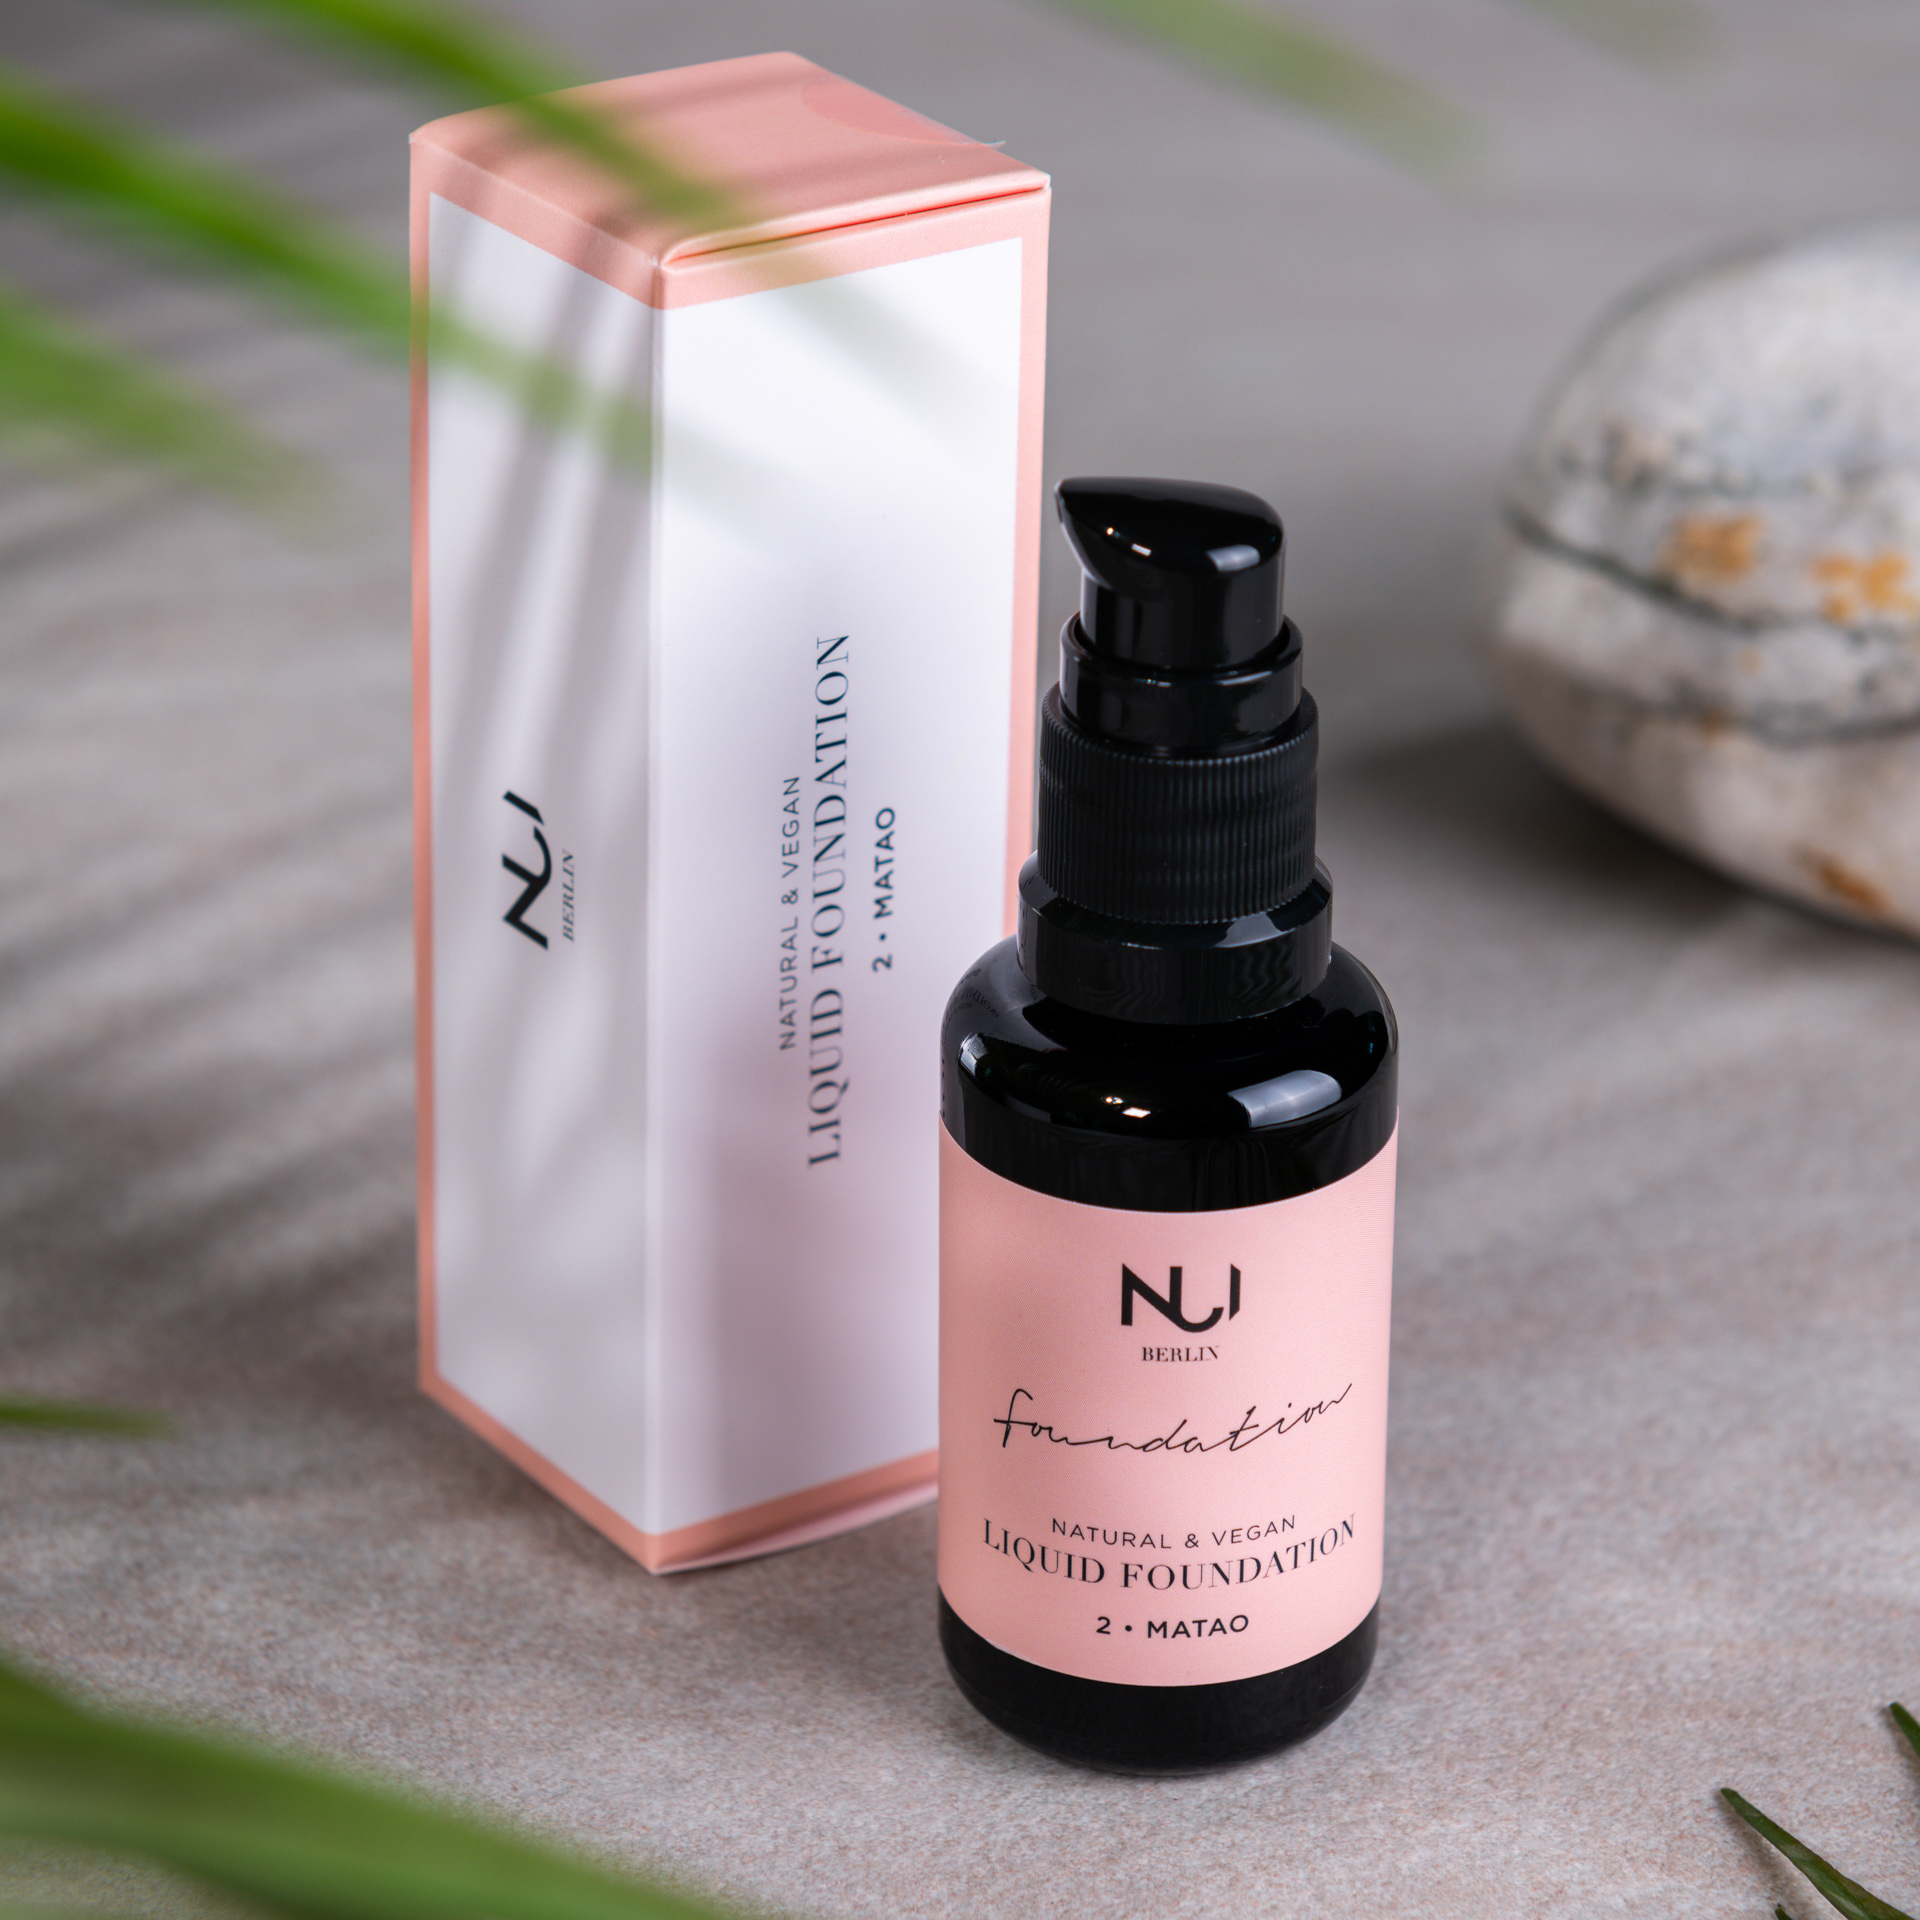 NUI Natural Liquid Foundation 02 MATAO